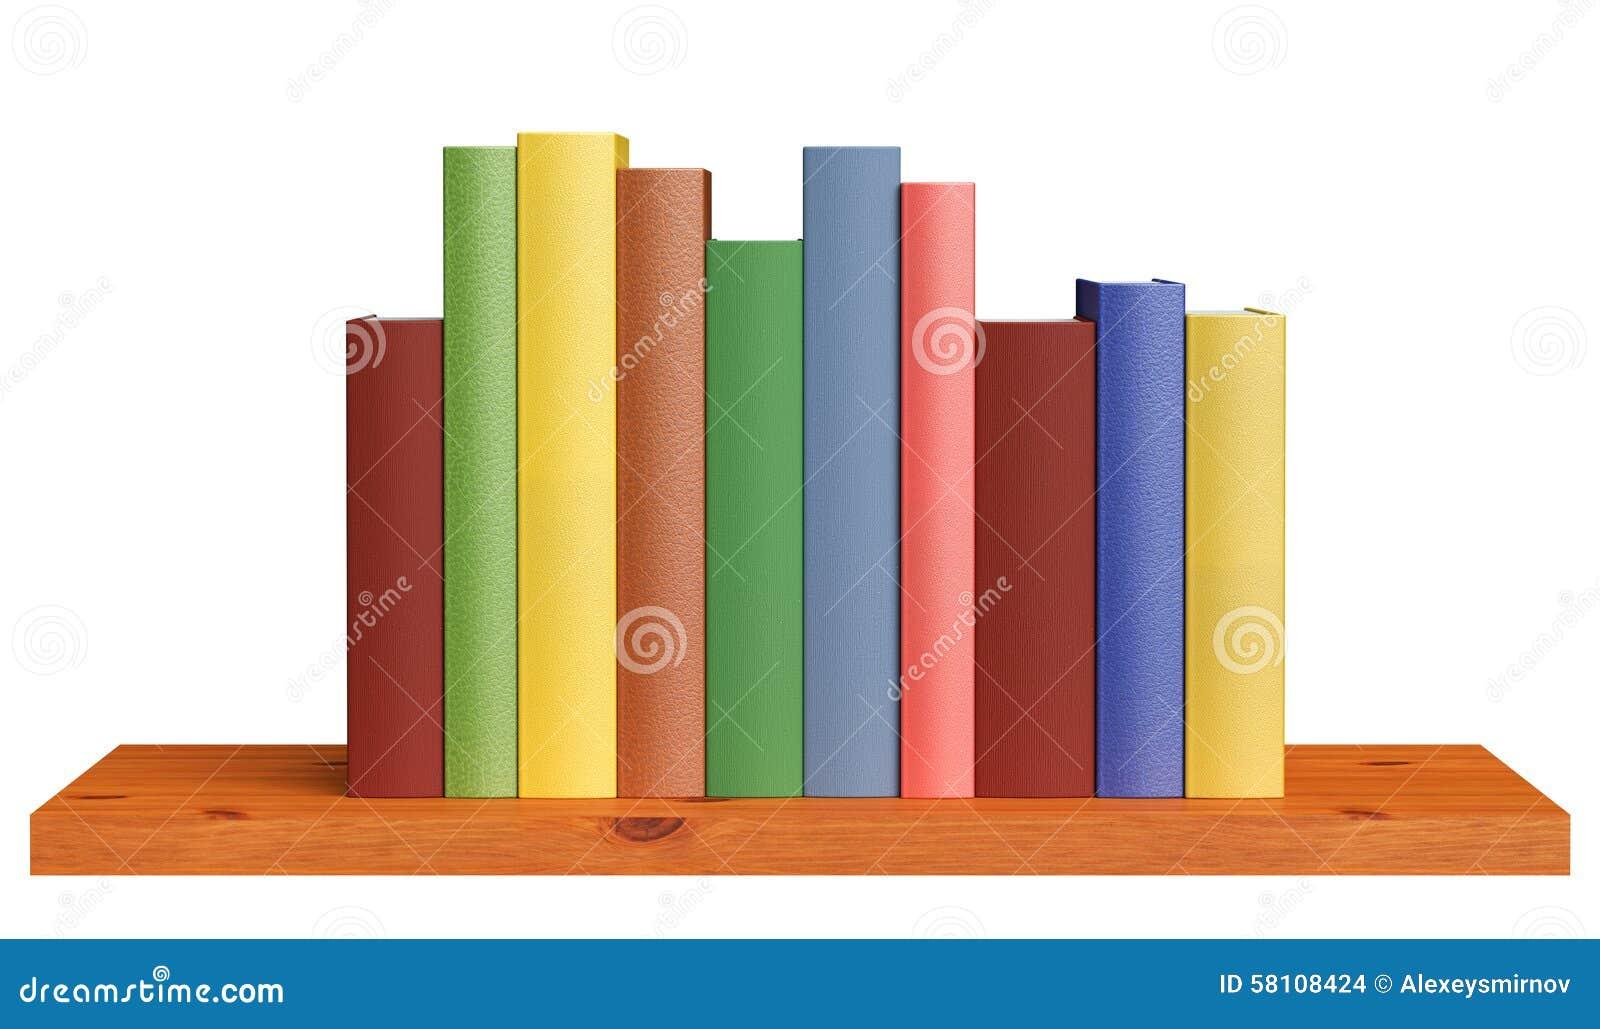 Wooden Bookshelf With Books Stock Illustration